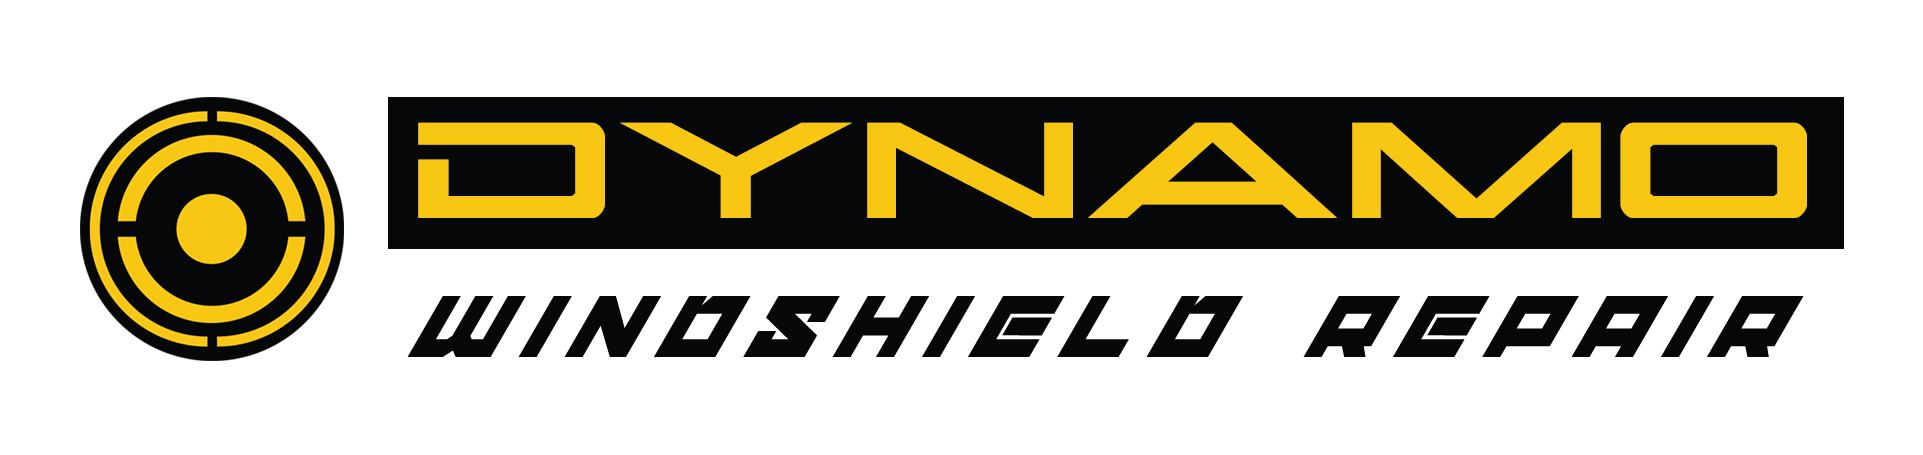 dynamo windshield repair logo